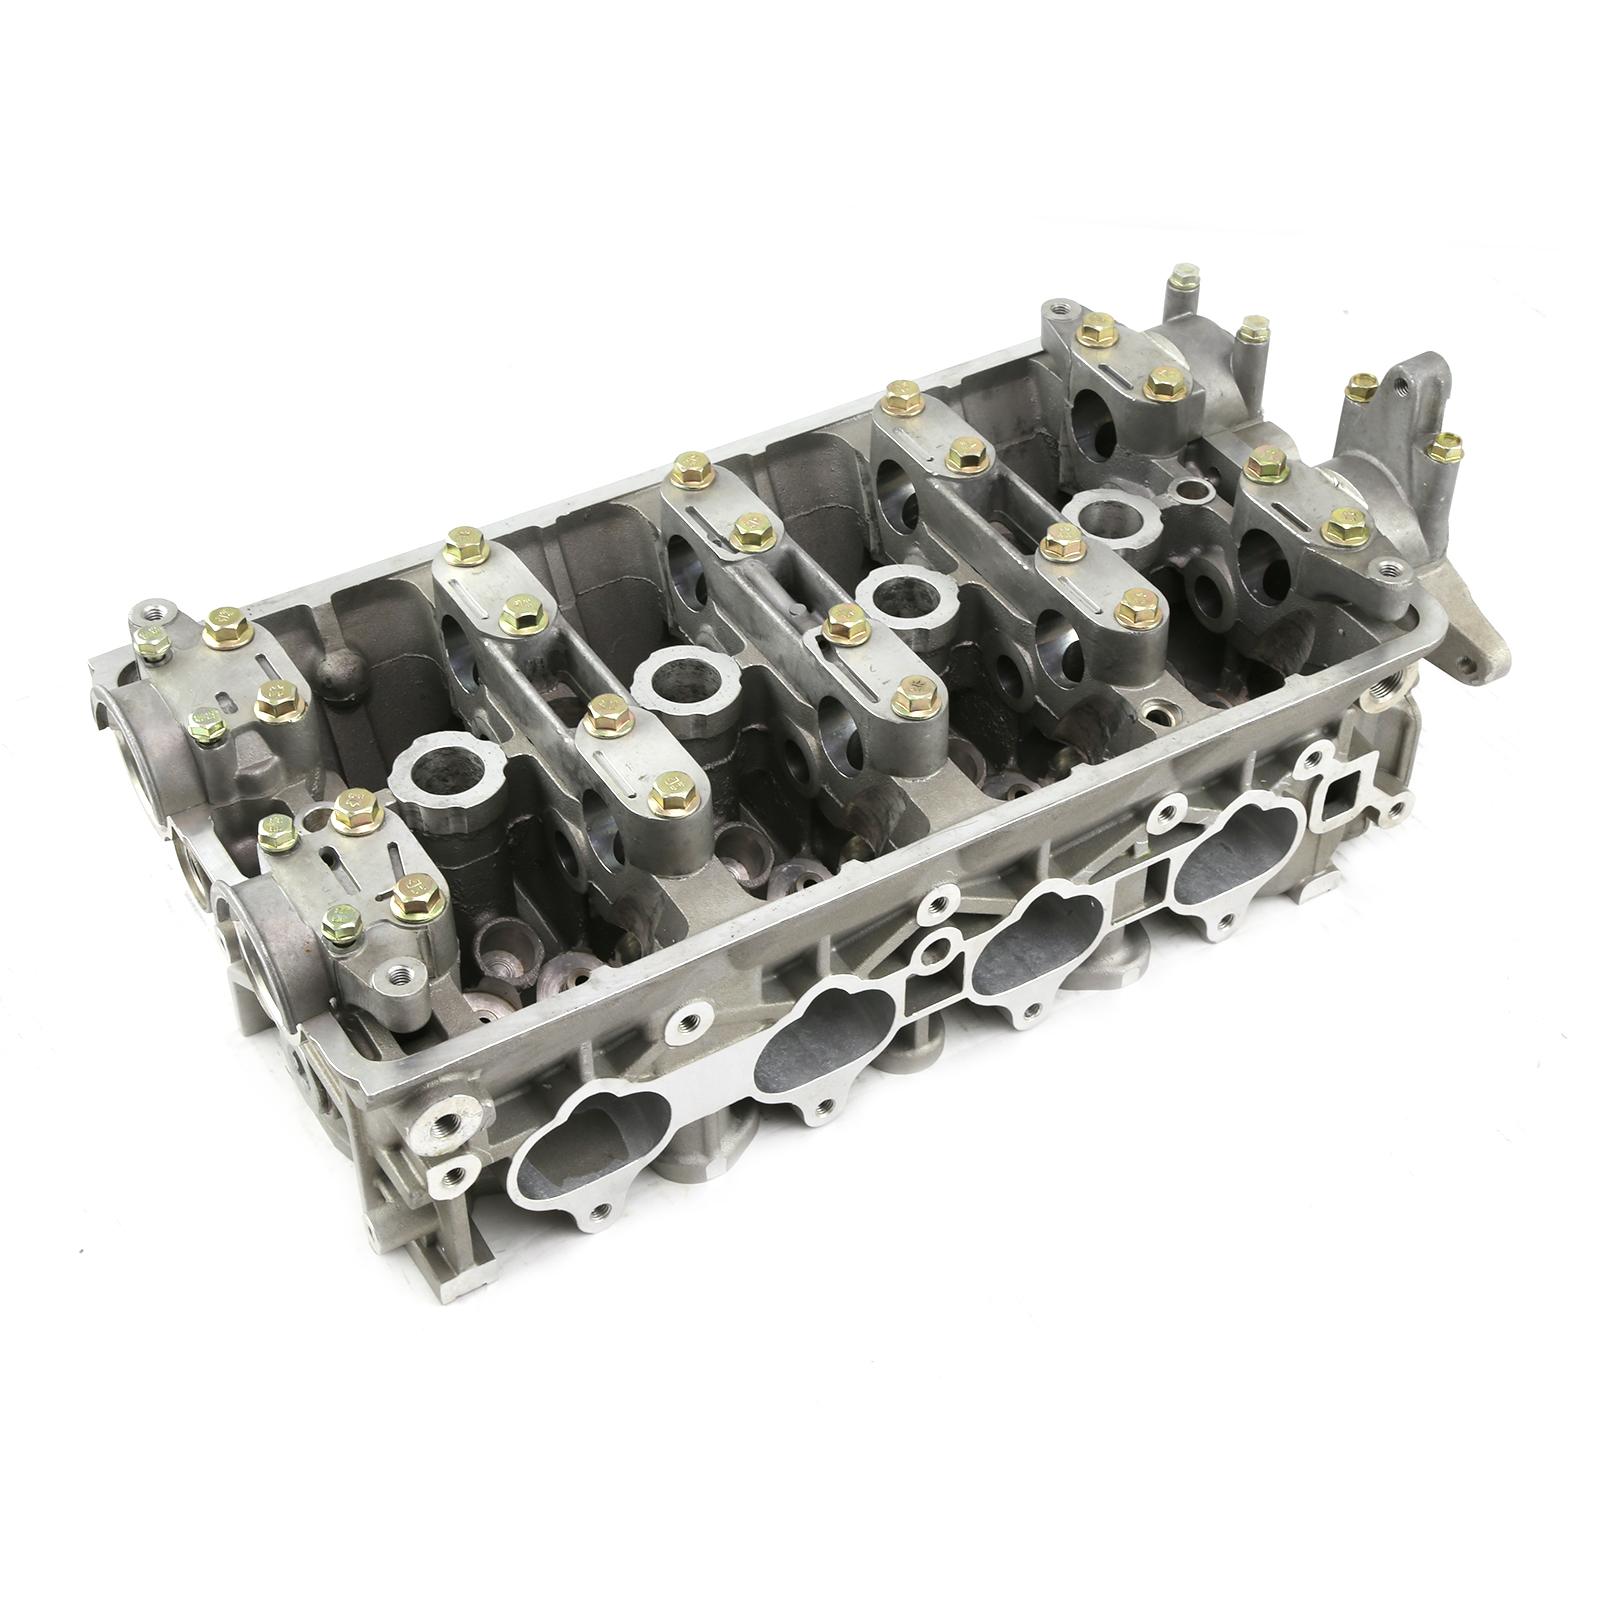 S2000 Honda Cylinder Heads: Honda 4Cyl B16A Vtec OEMcc OEMcc Full CNC Bare Alum